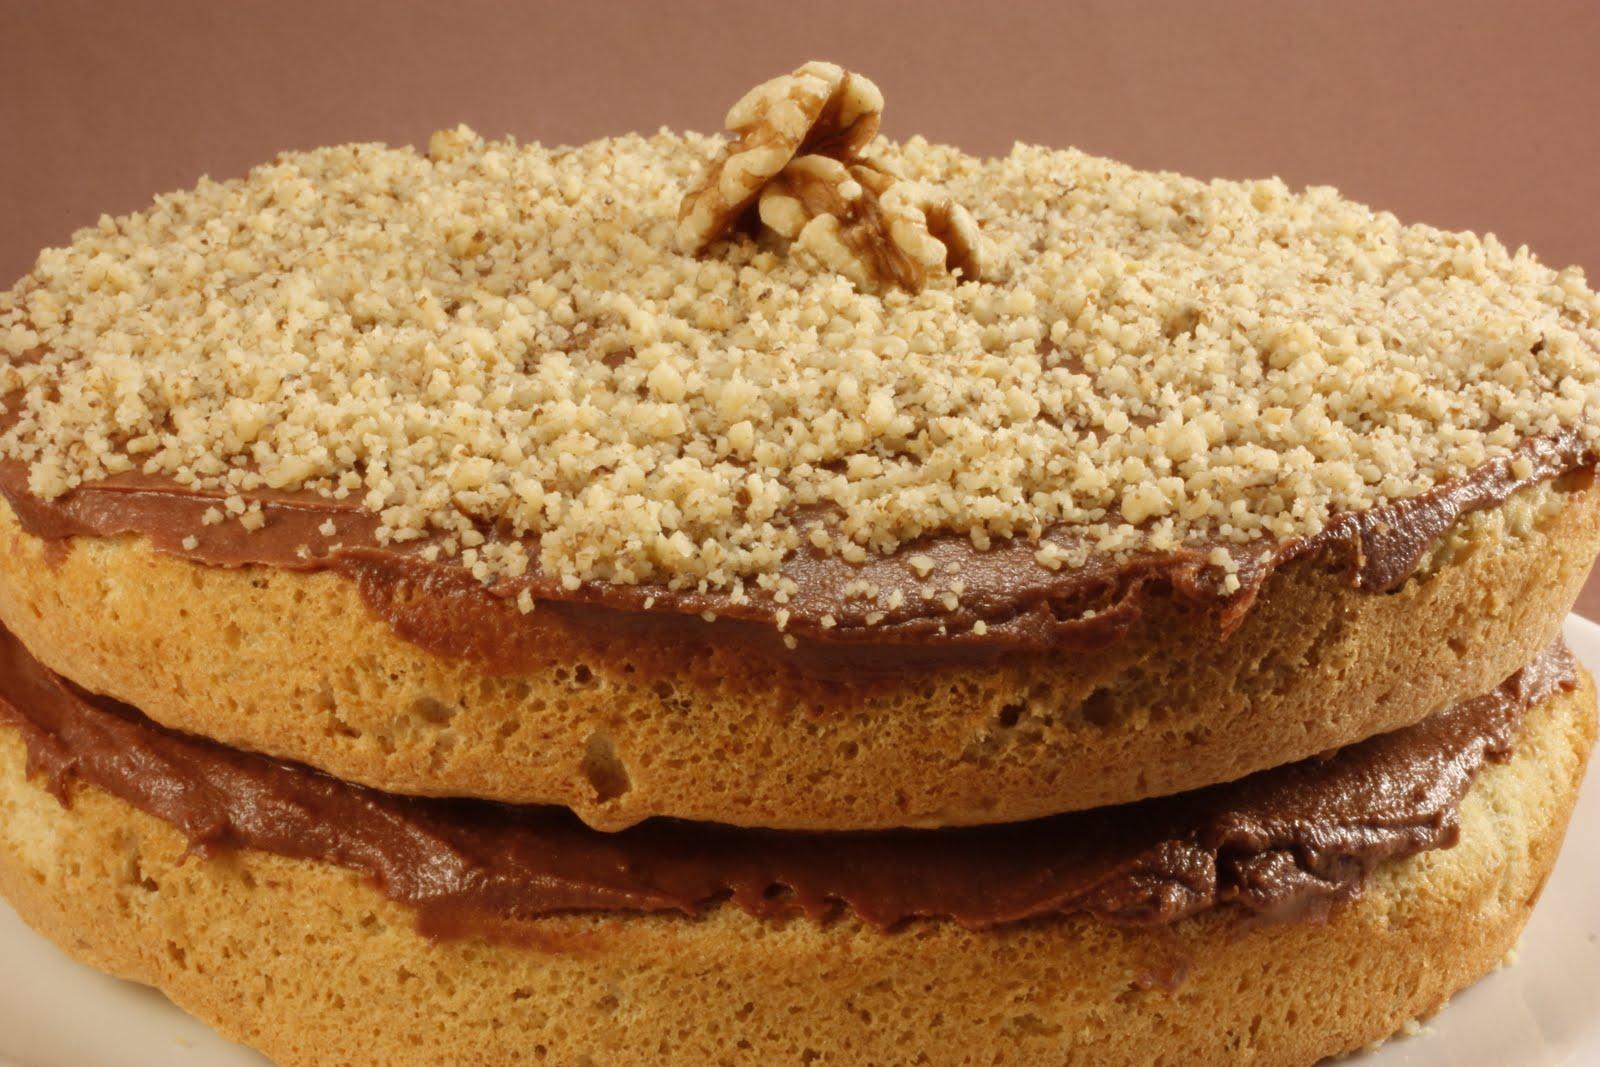 Chef Chuck's Cucina: Chef Chuck's Walnut Cake